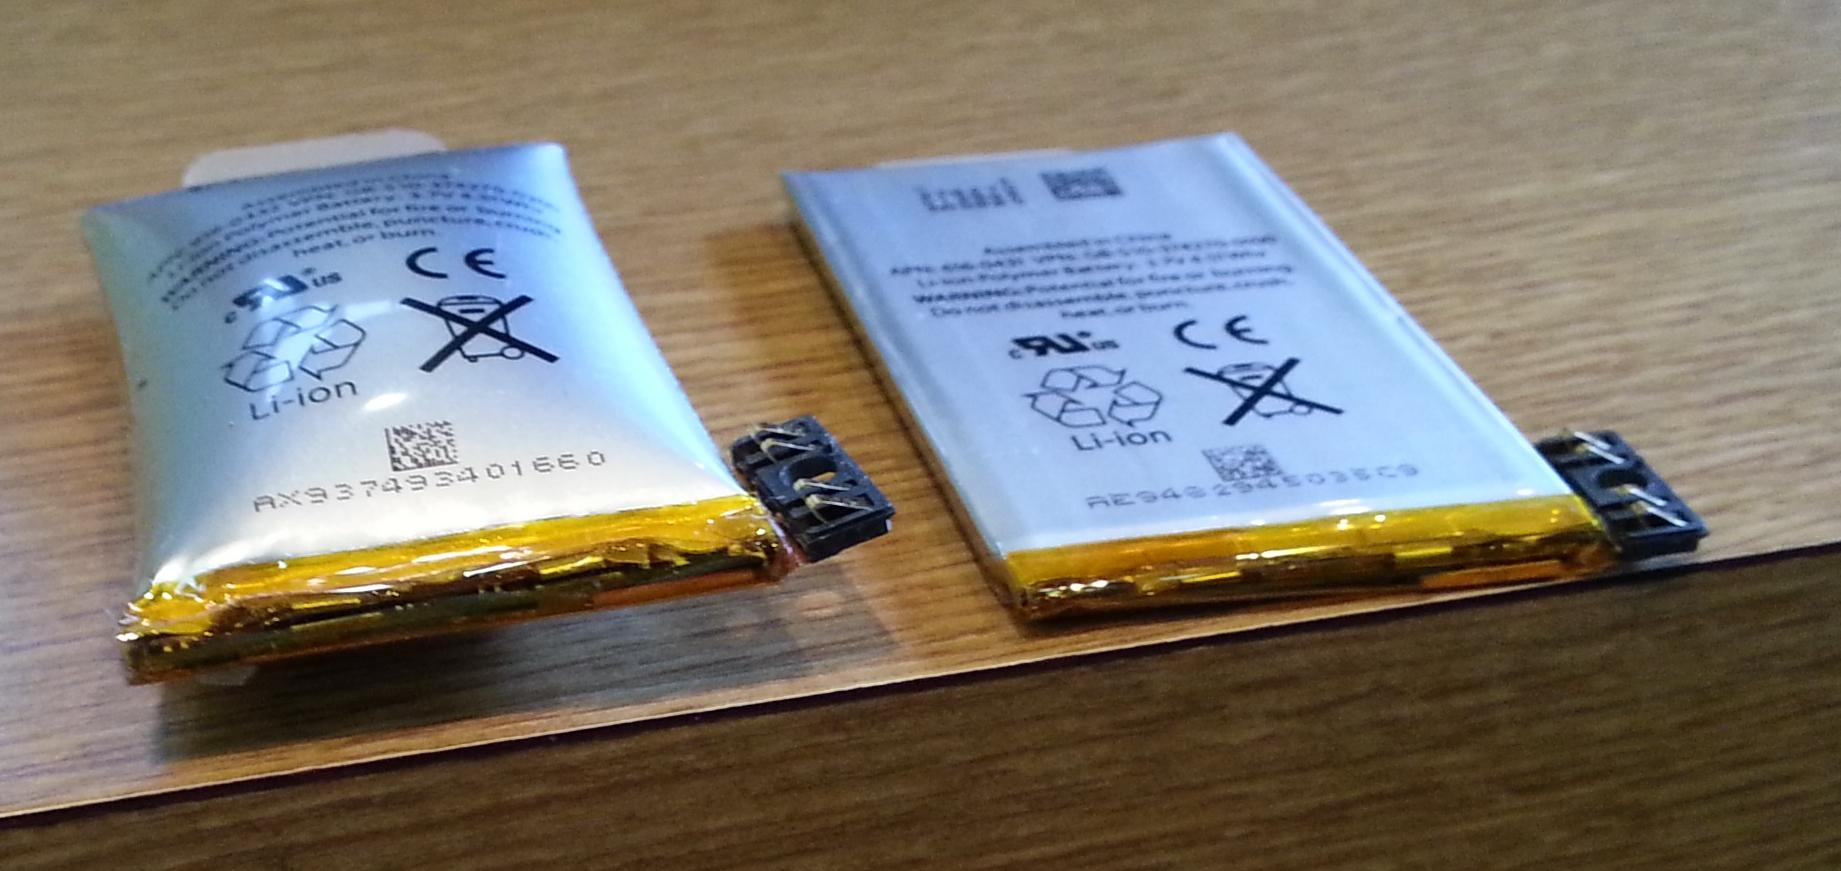 Batterie Gonflee Iphone